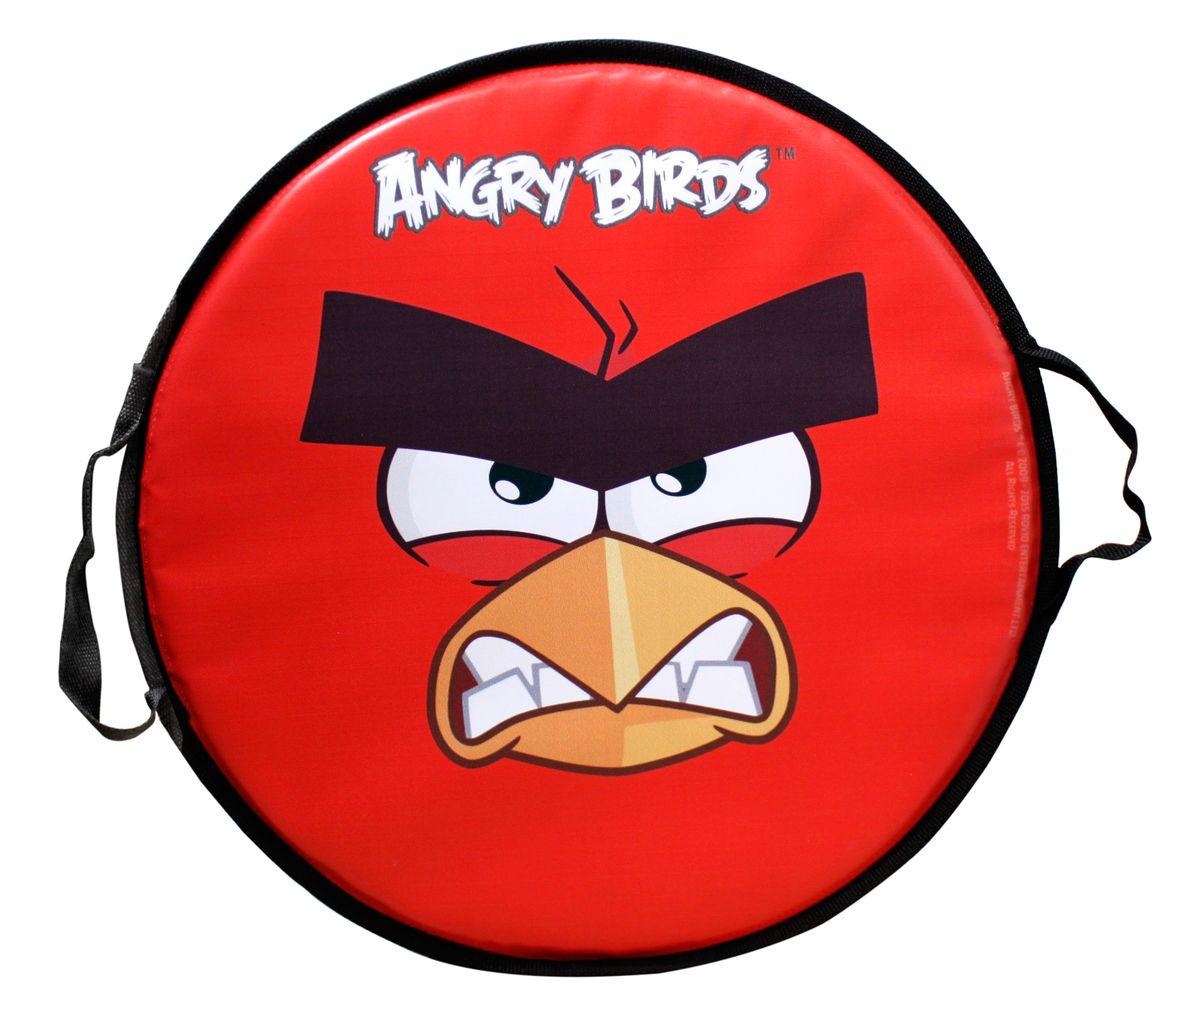 Angry Birds Ледянка круглая Angry Birds 52 см Т58162 angry birds вн14155